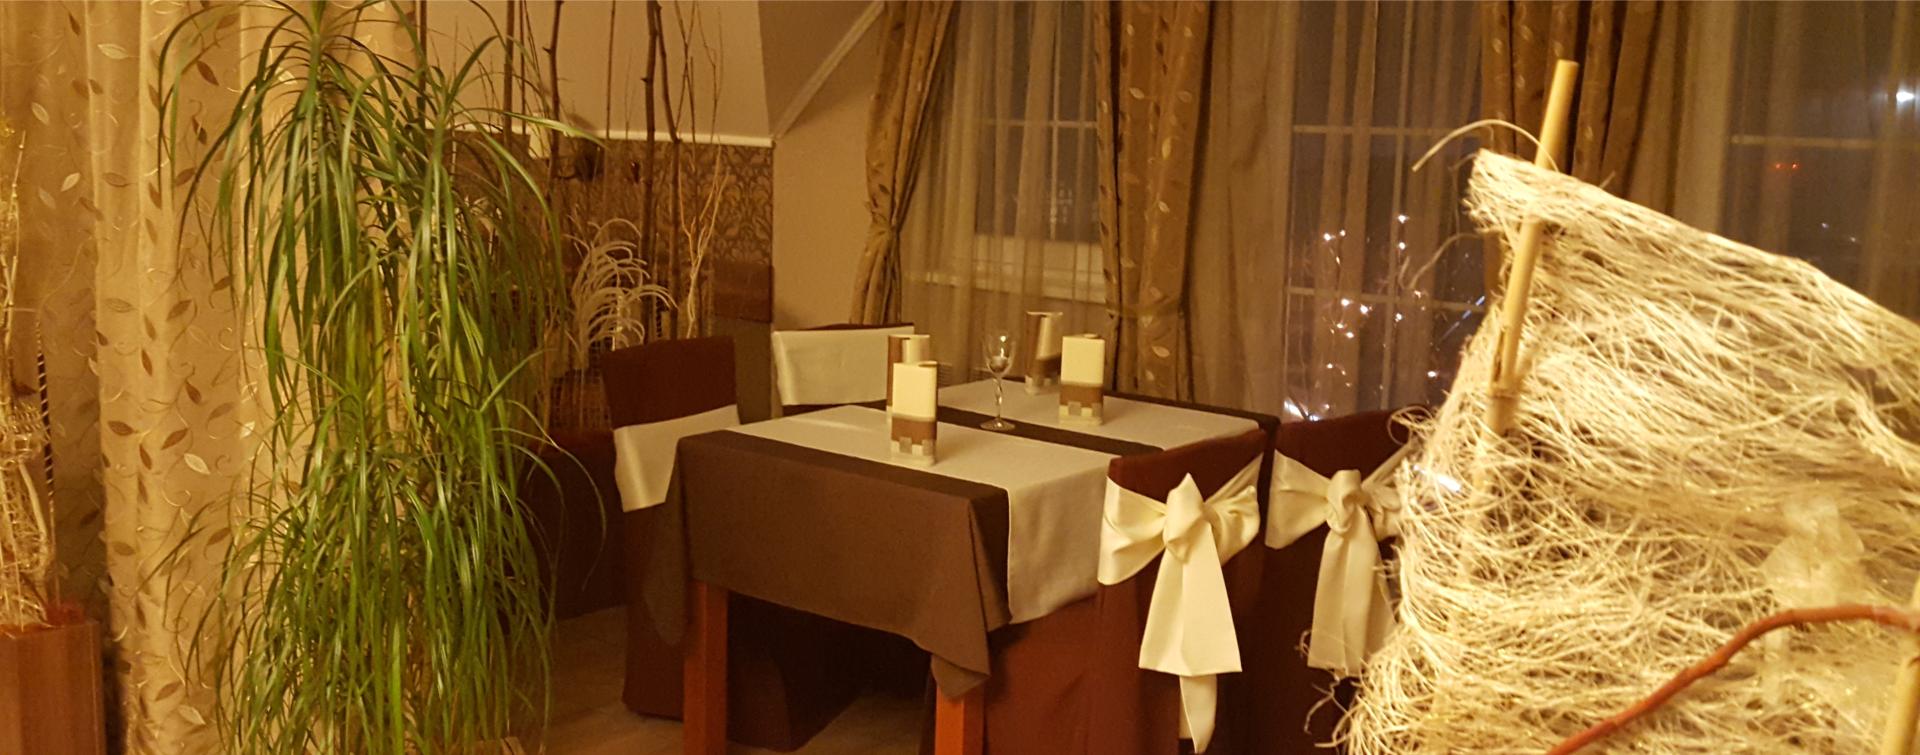 Reštaurácia Majer